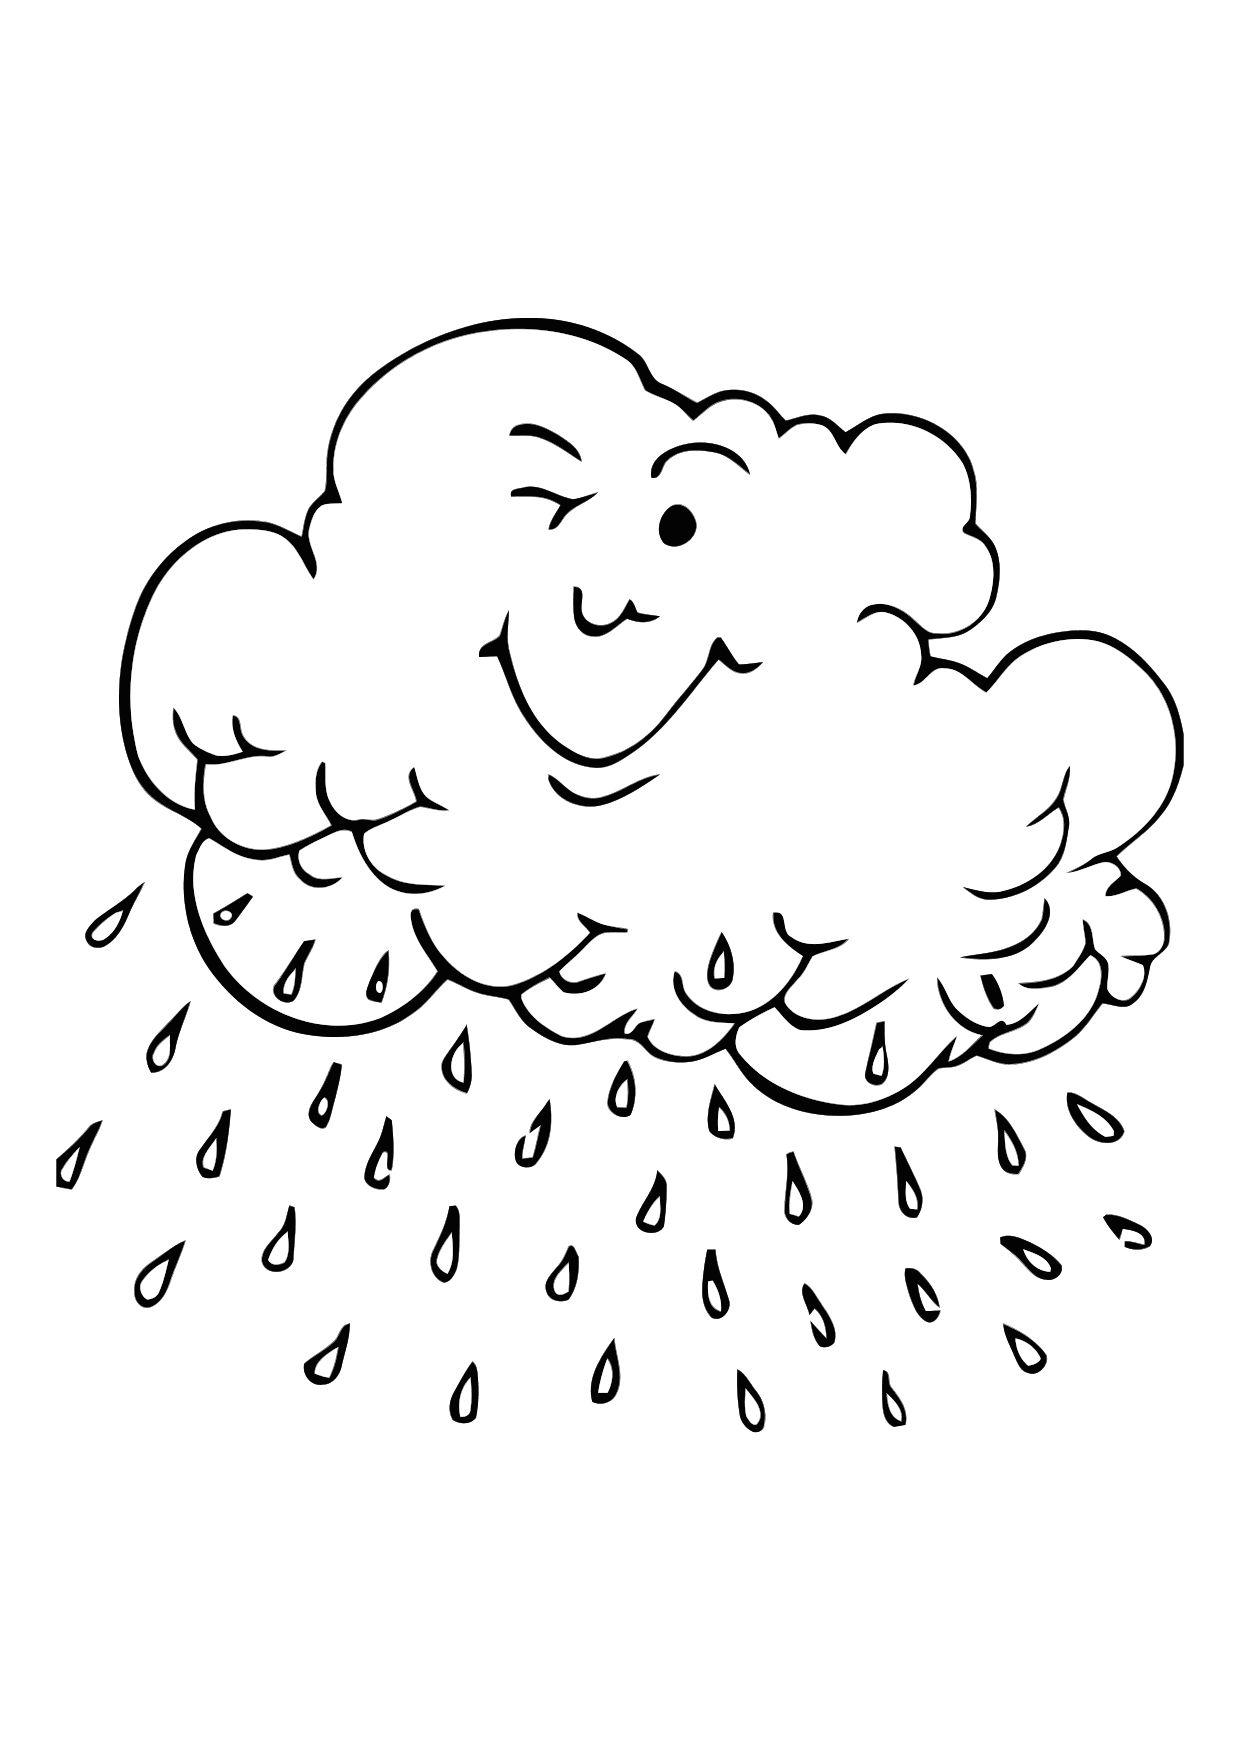 Dibujo para colorear Nube de lluvia   Img 11352